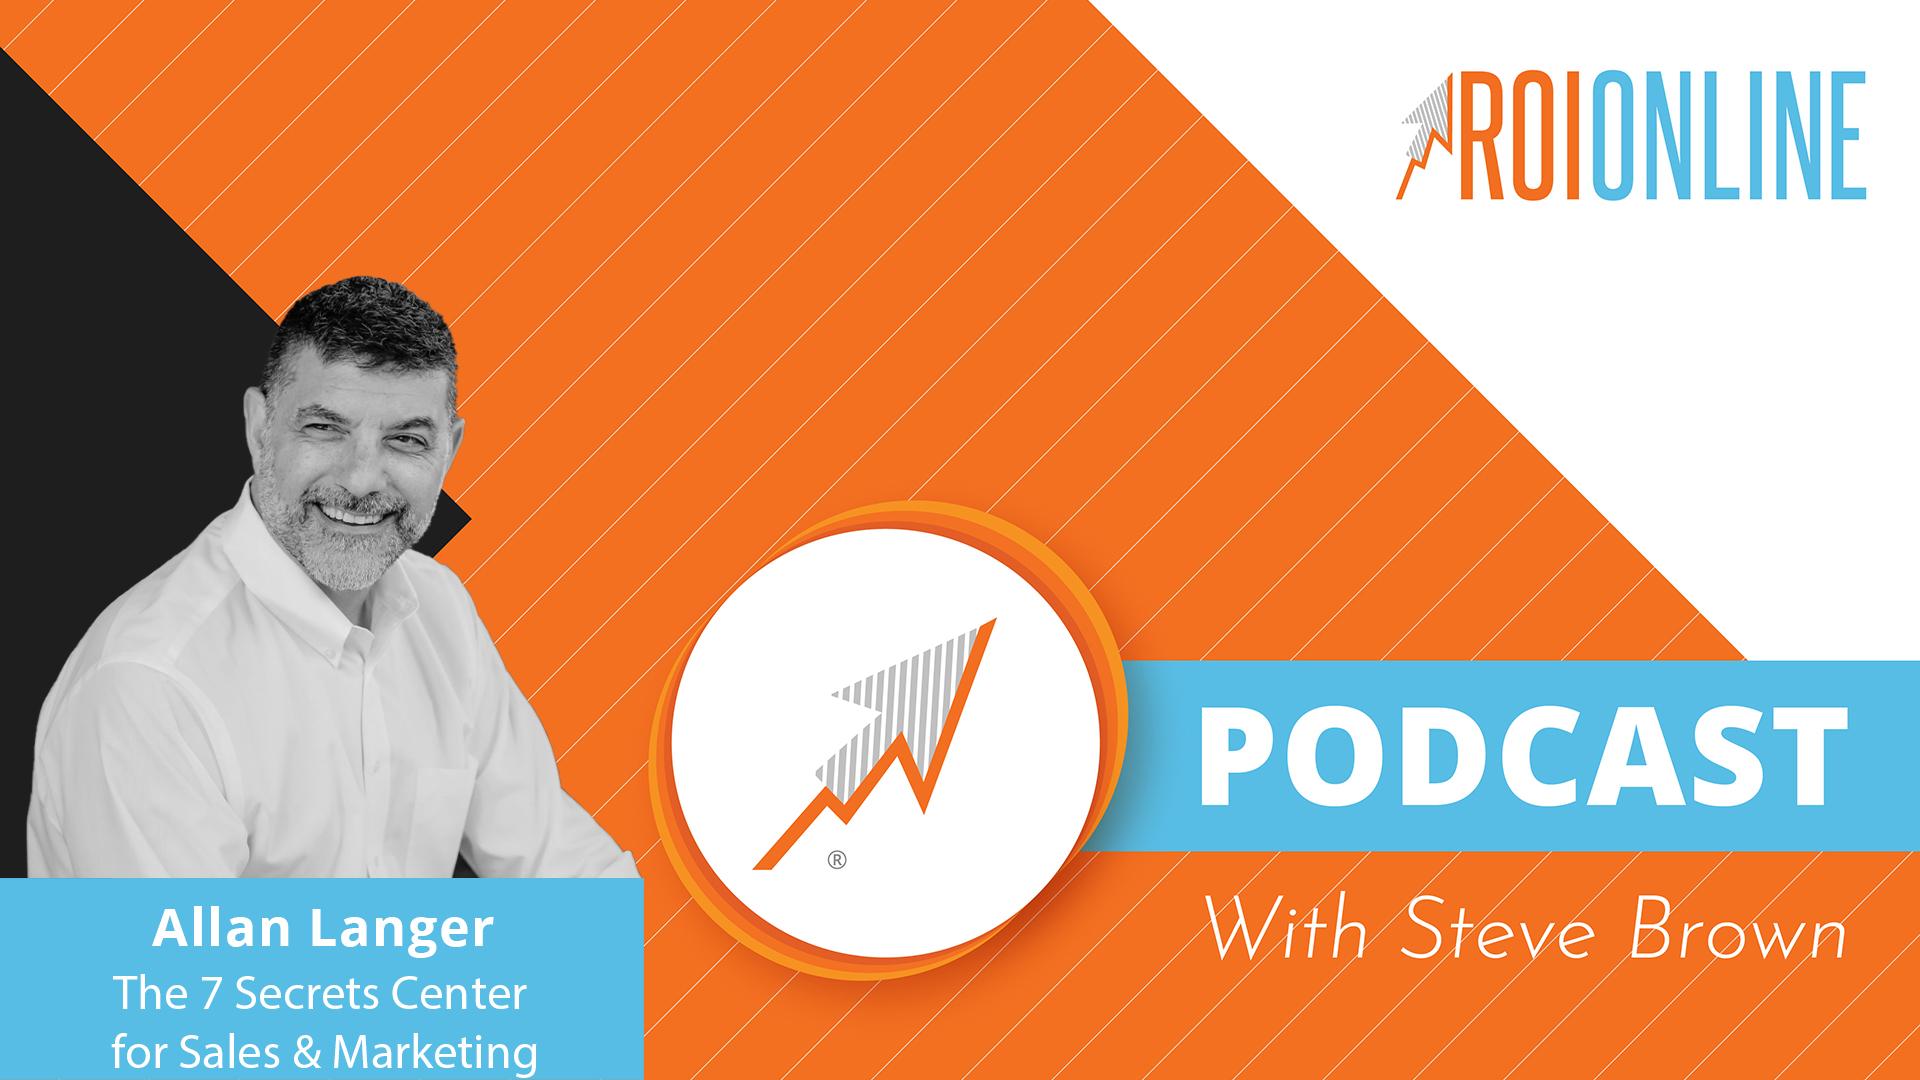 podcast thumbnail on an orange background